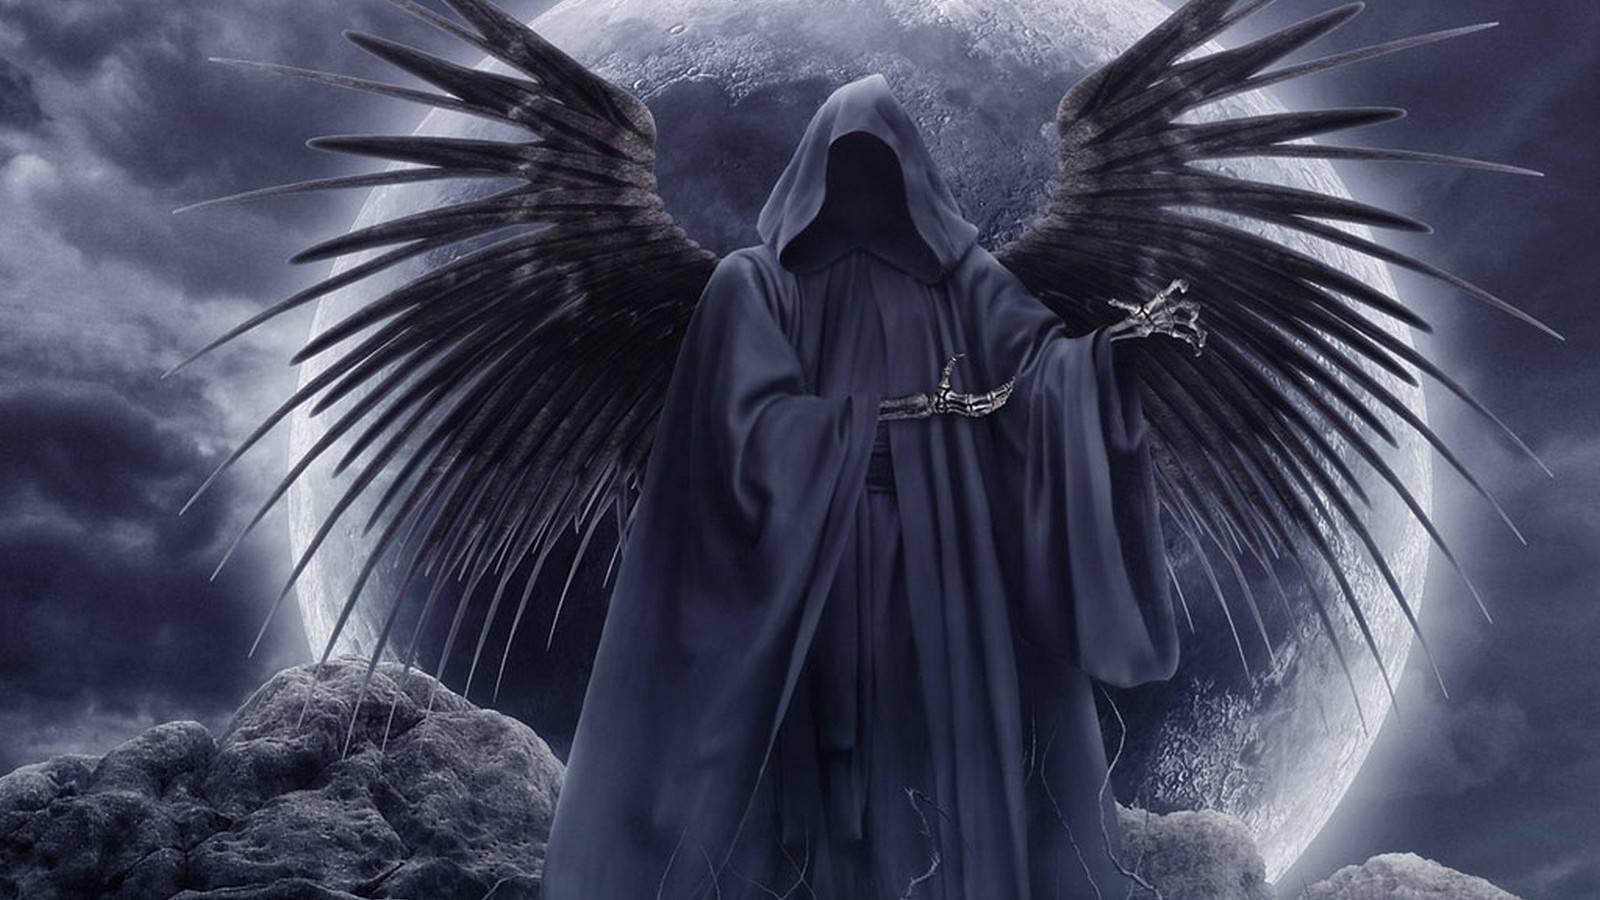 Grim Reaper 1600900 Wallpaper 921534 1600x900